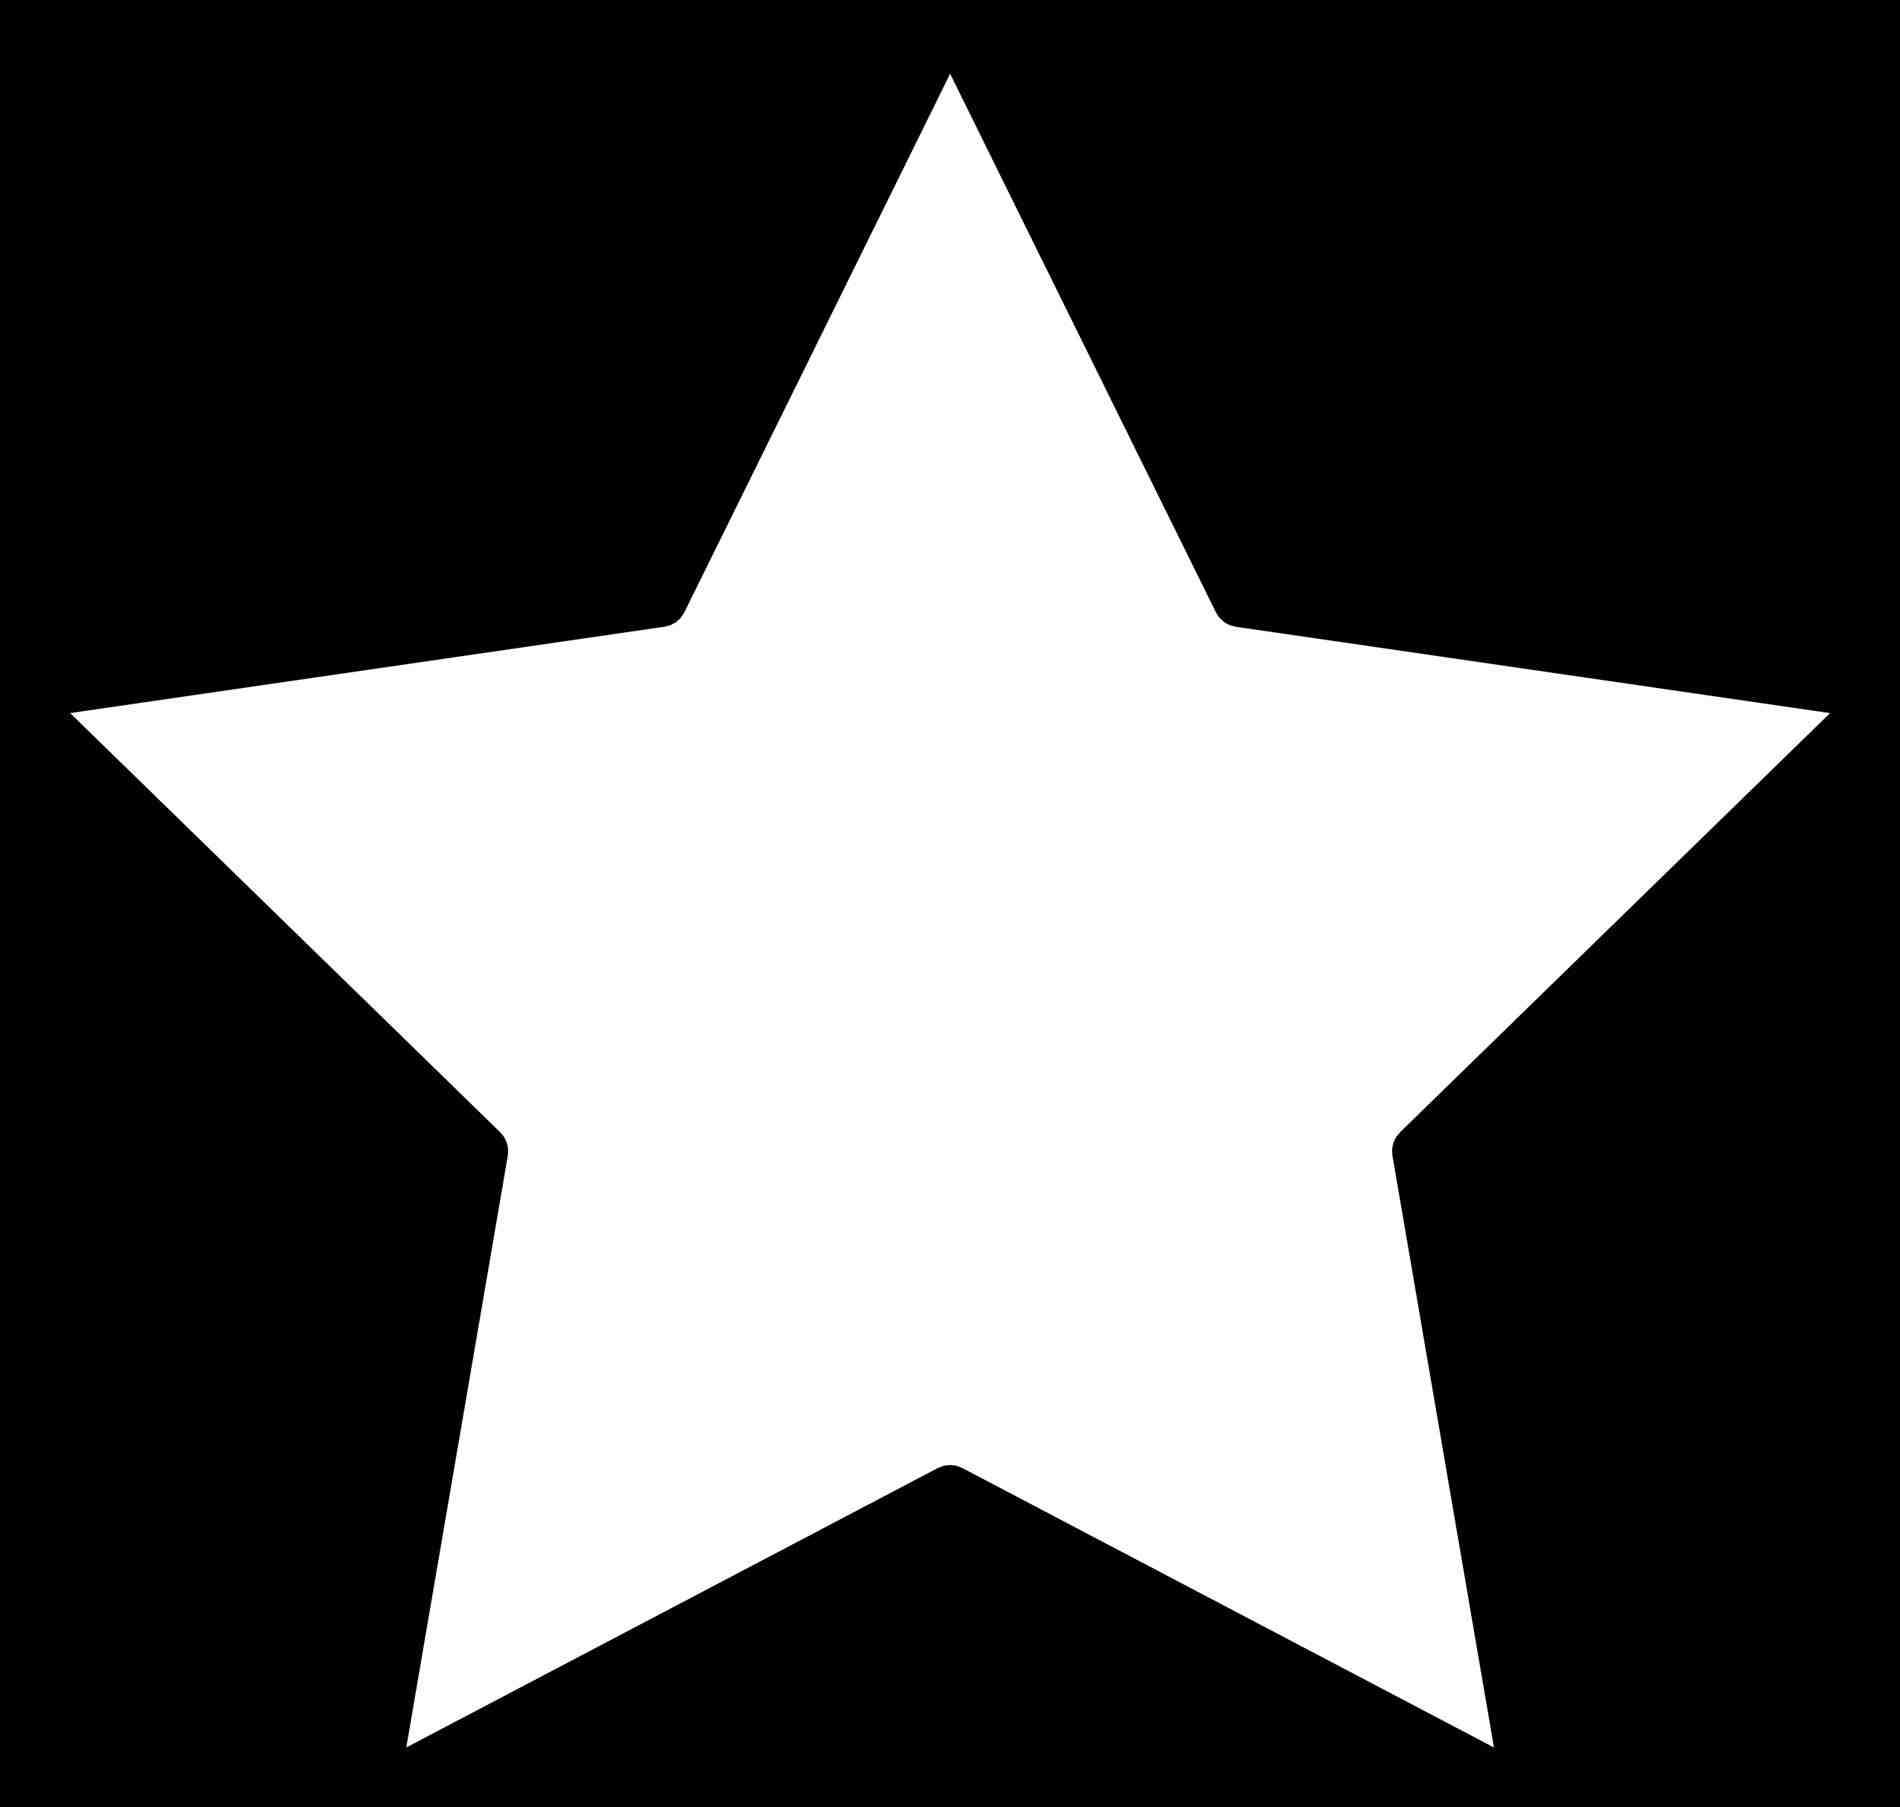 1900x1807 Christmas Star Black White Clipart. Snowman Black And White